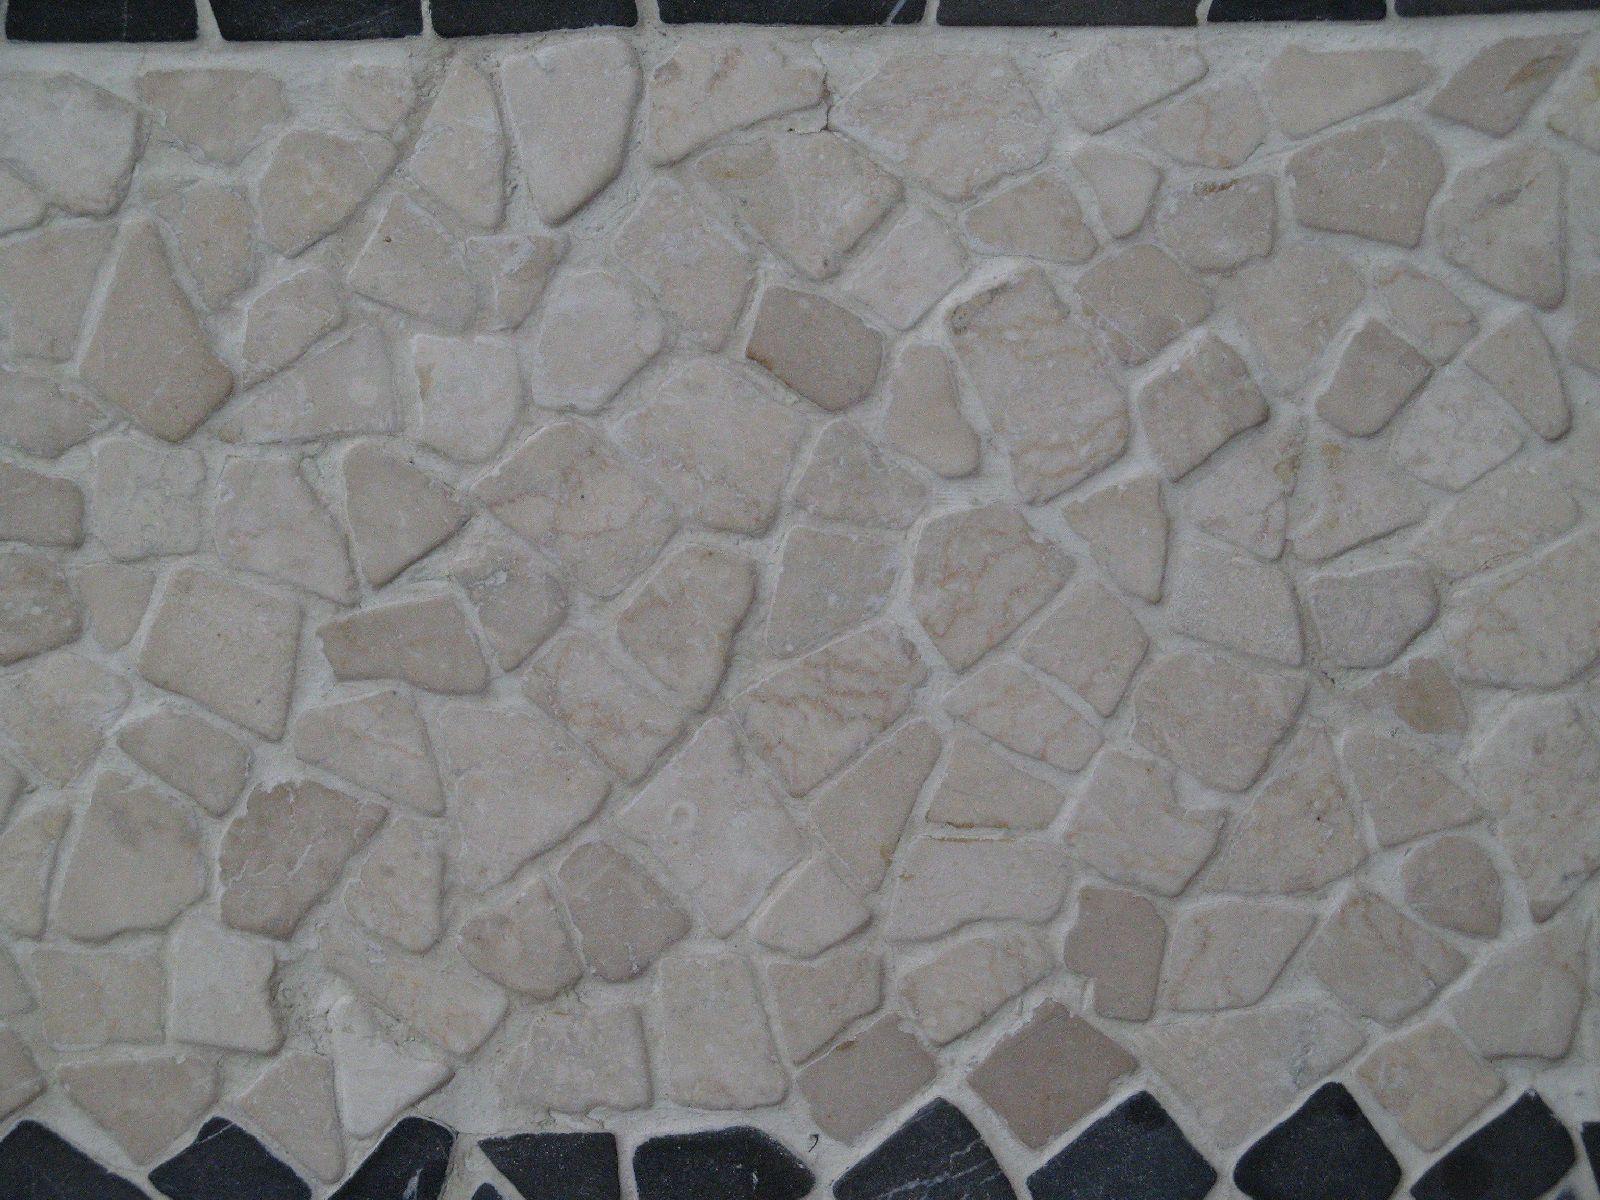 Stone_Texture_B_4687